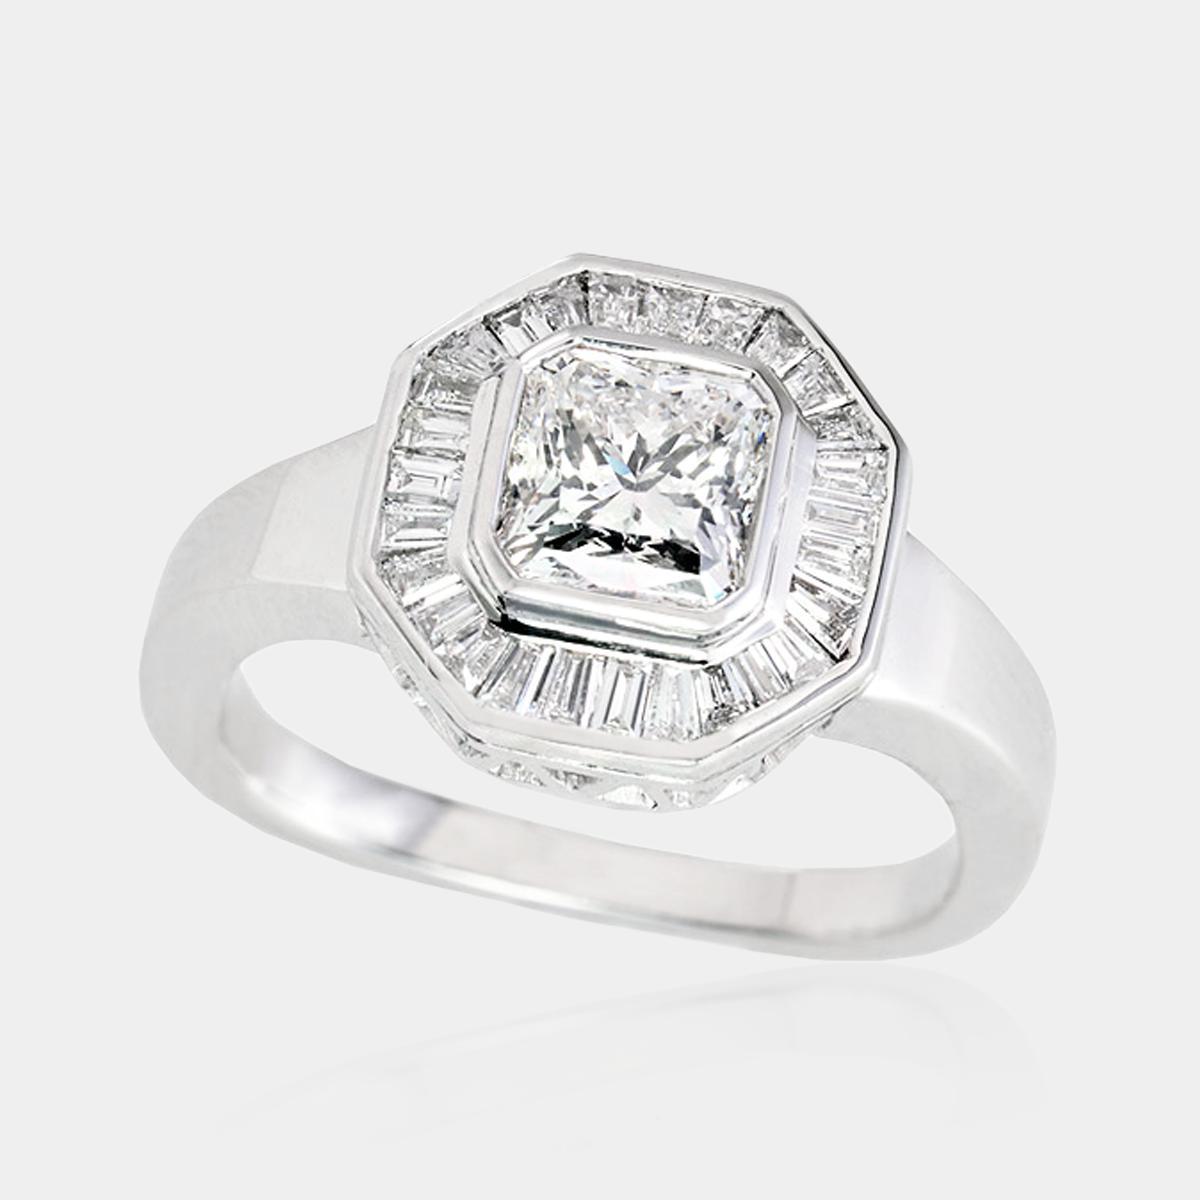 Engagement Rings Dress Rings Diamond Radiant Cut Halo Art Deco Product 100188